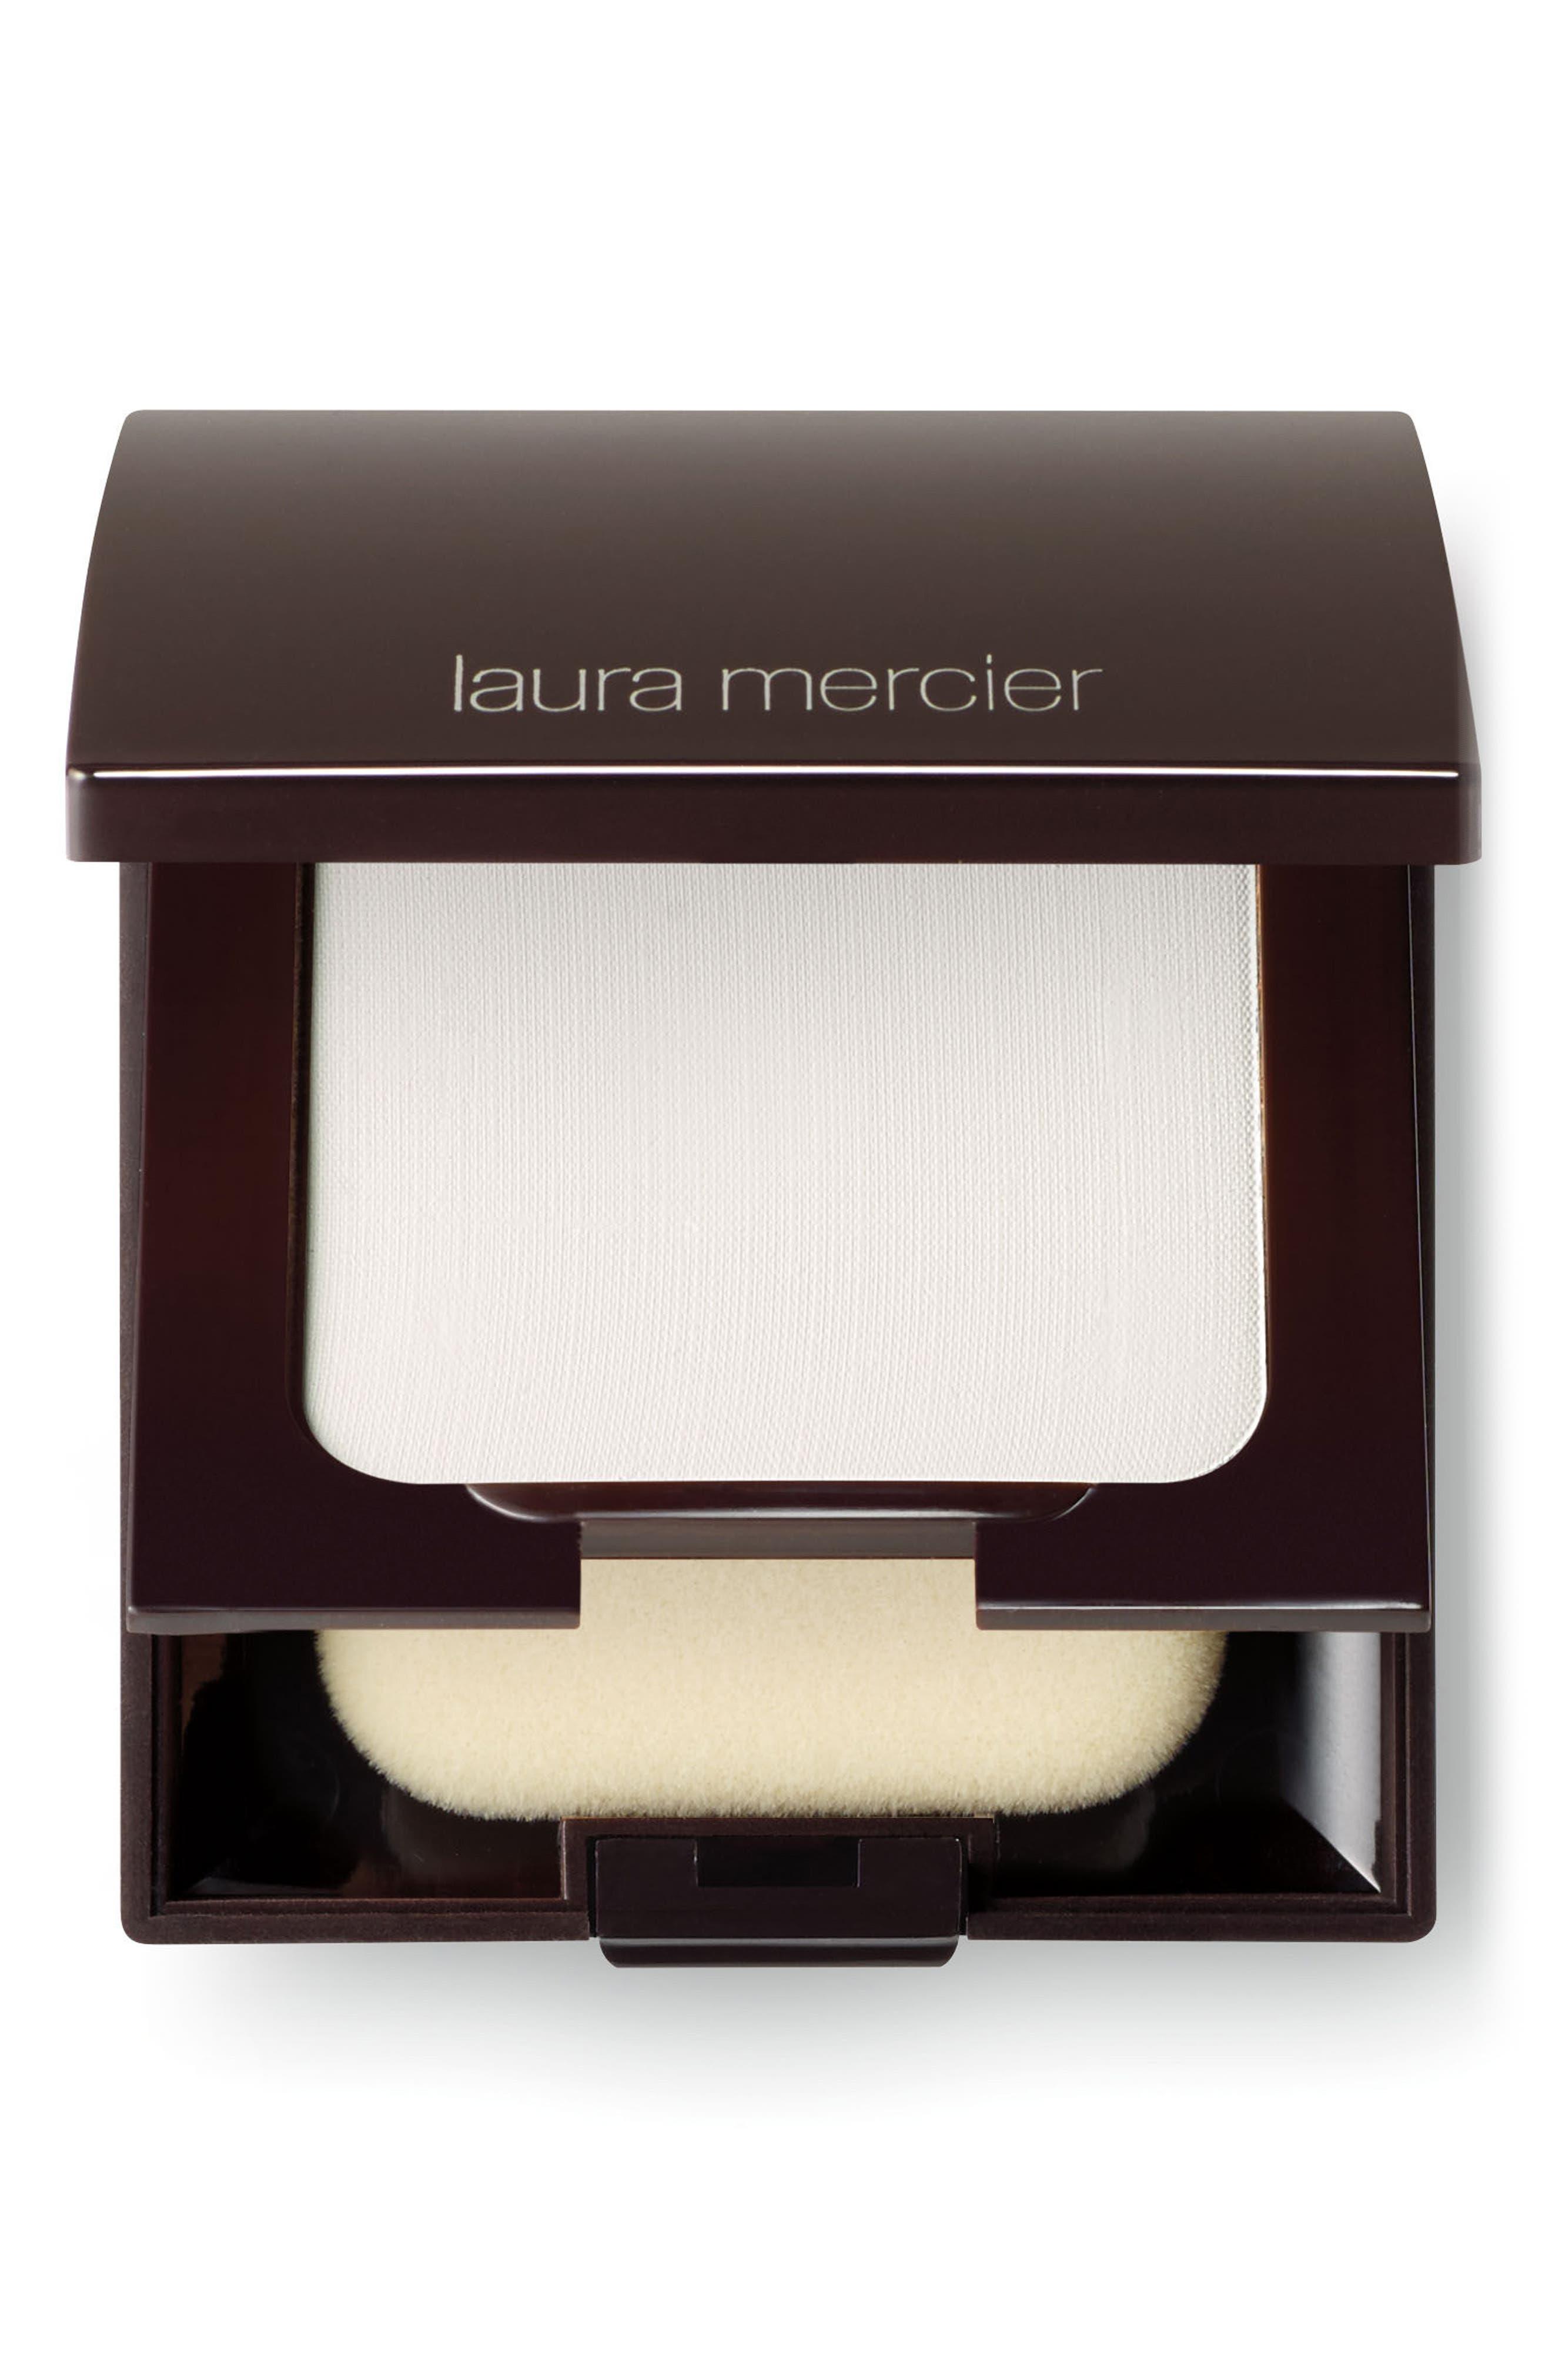 LAURA MERCIER, Invisible Pressed Powder Compact, Main thumbnail 1, color, INVISIBLE